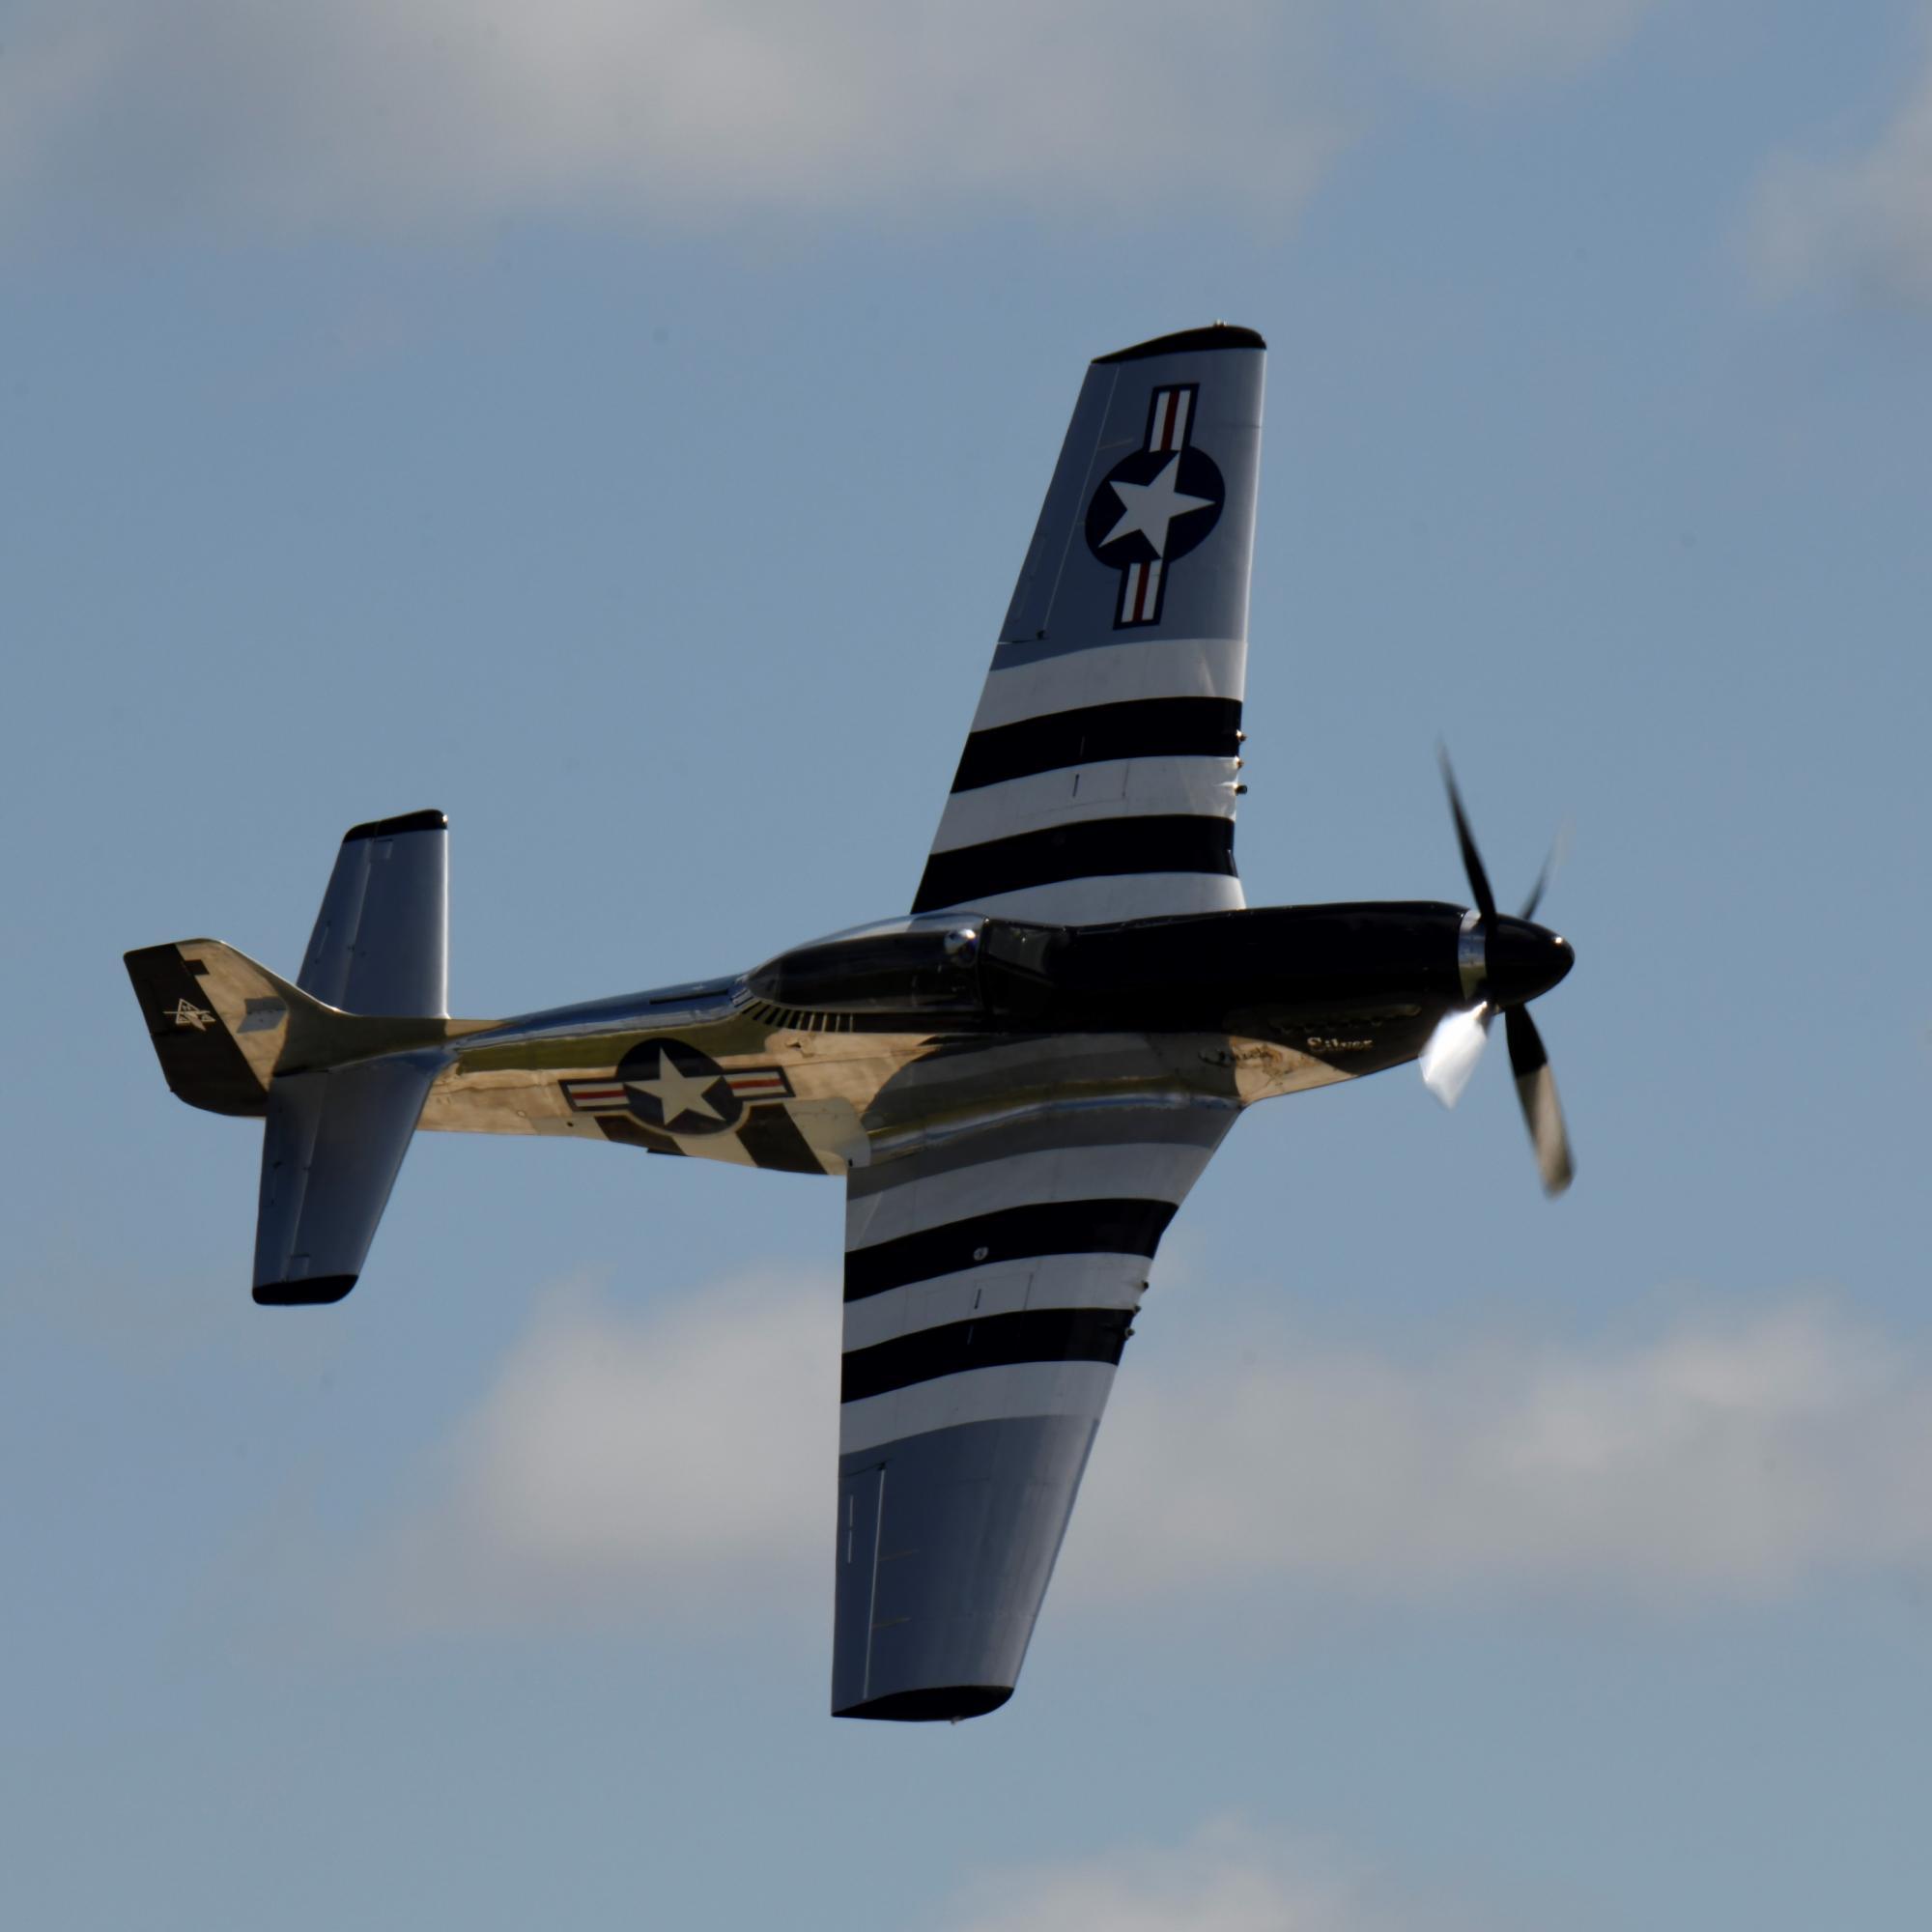 Spitfire004